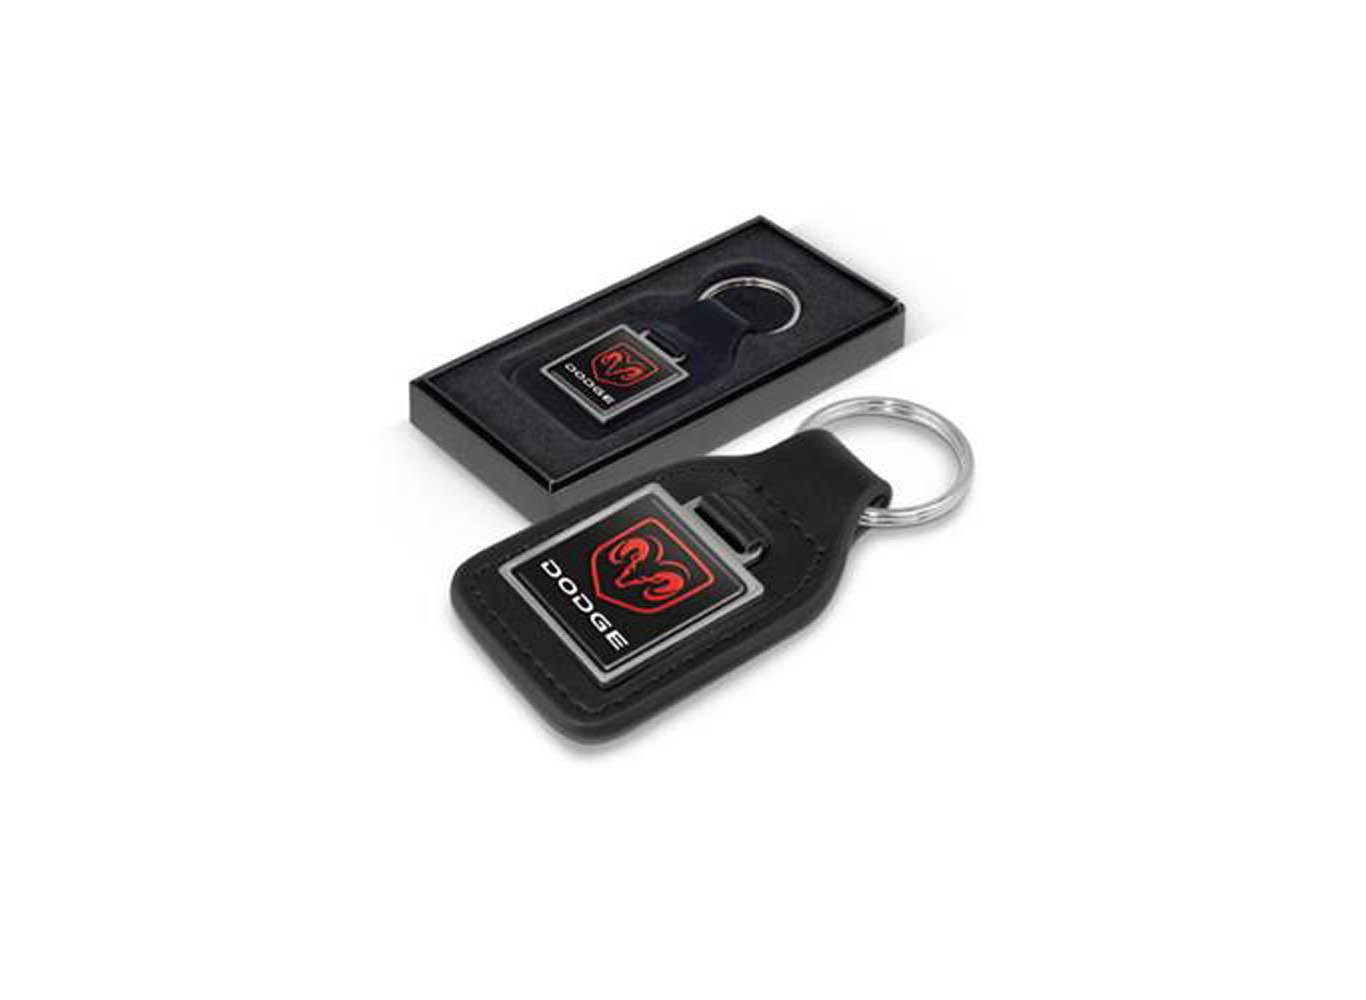 Premium Quality Leather Car Keychain